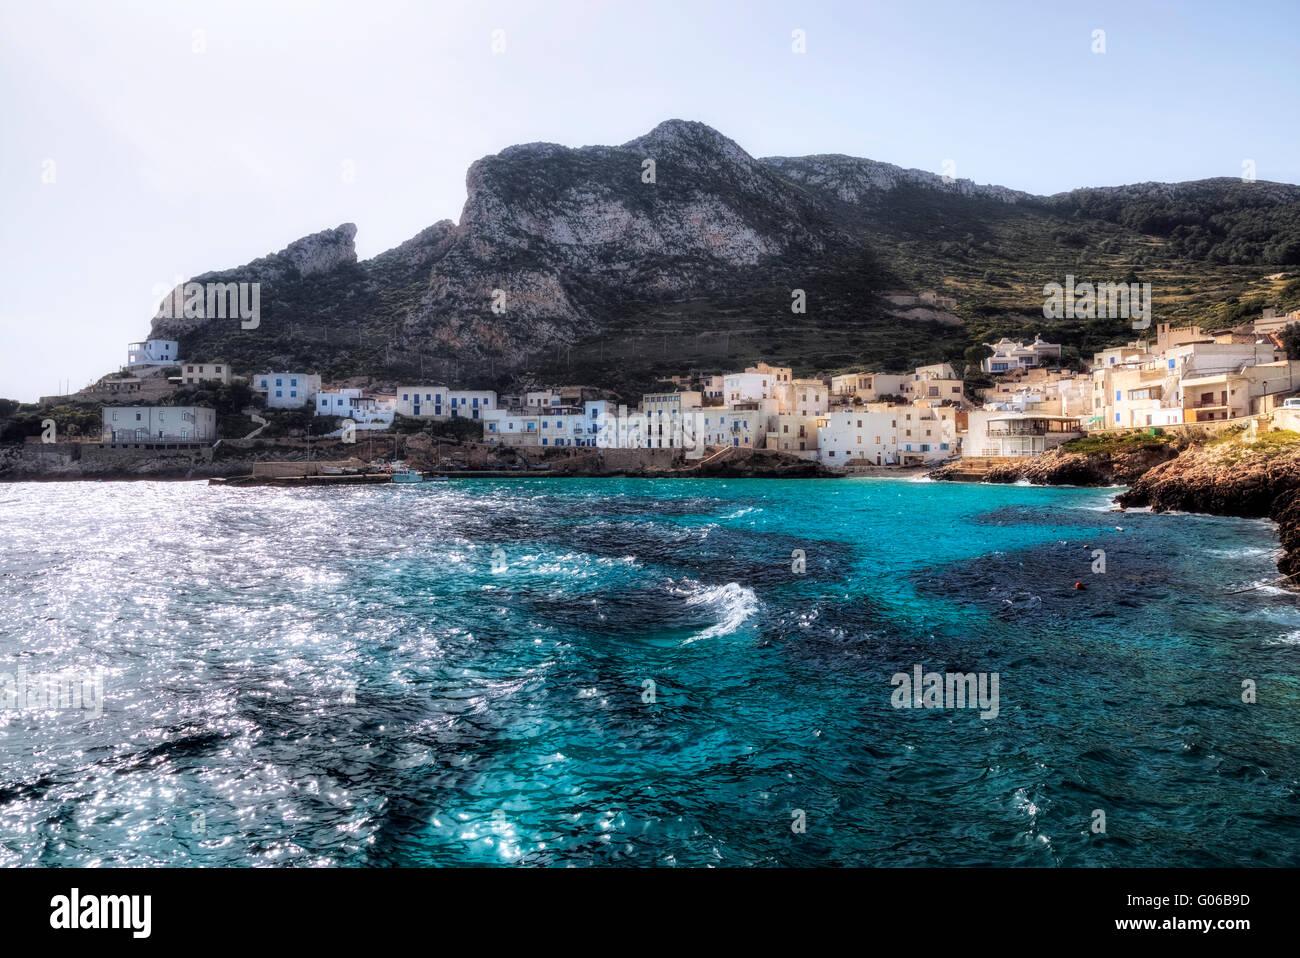 Levanzo, Aegadian Islands, Trapani, Sicily, Italy - Stock Image